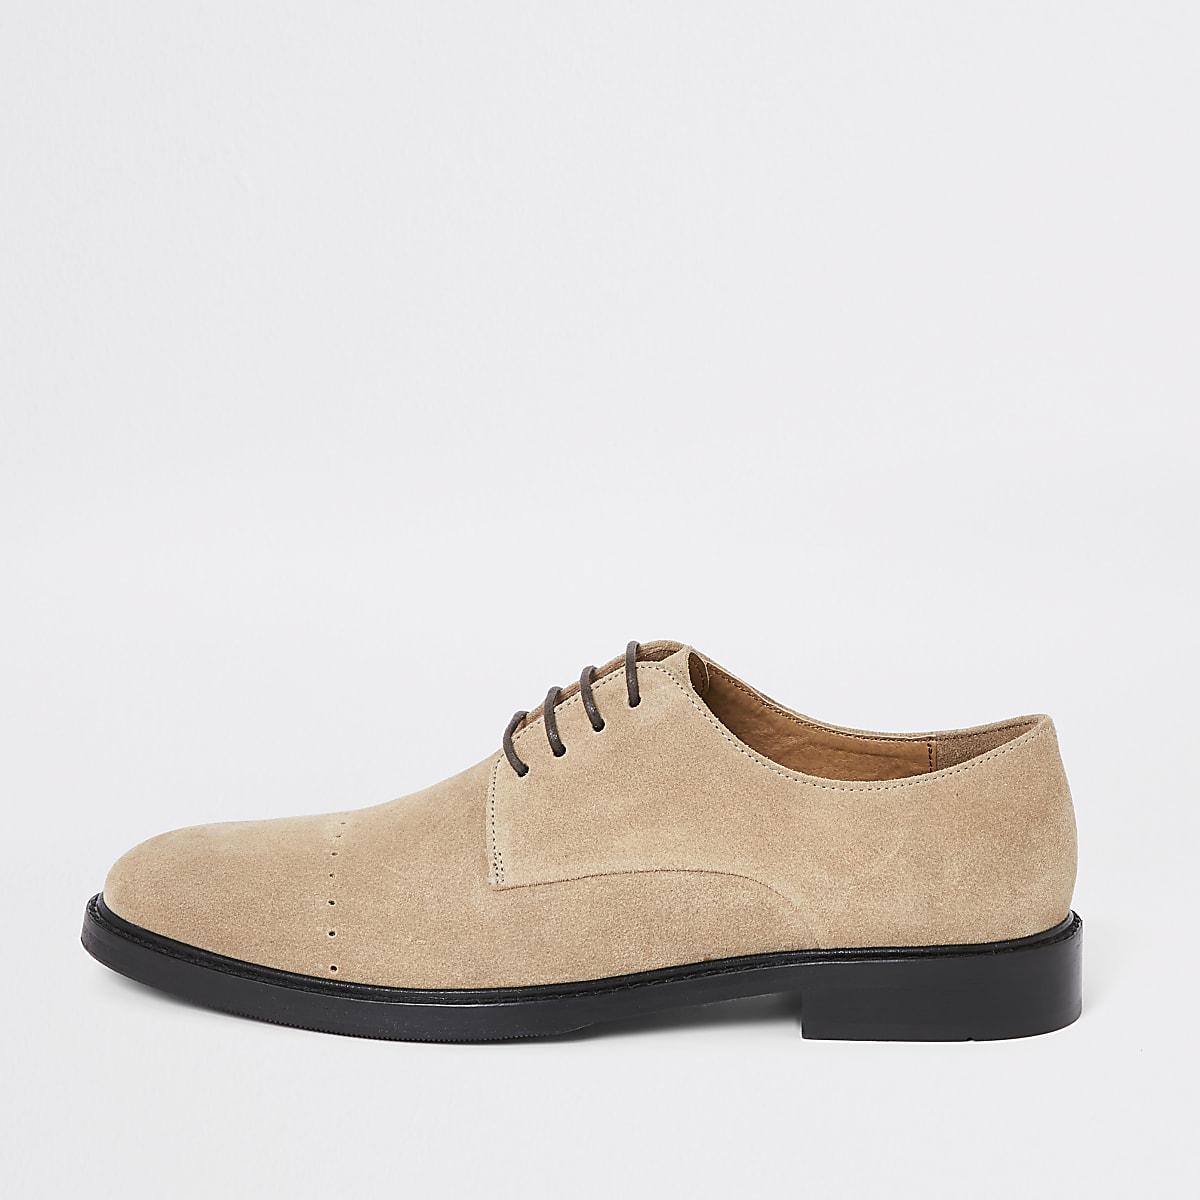 Chaussures derby lacée en daim grège